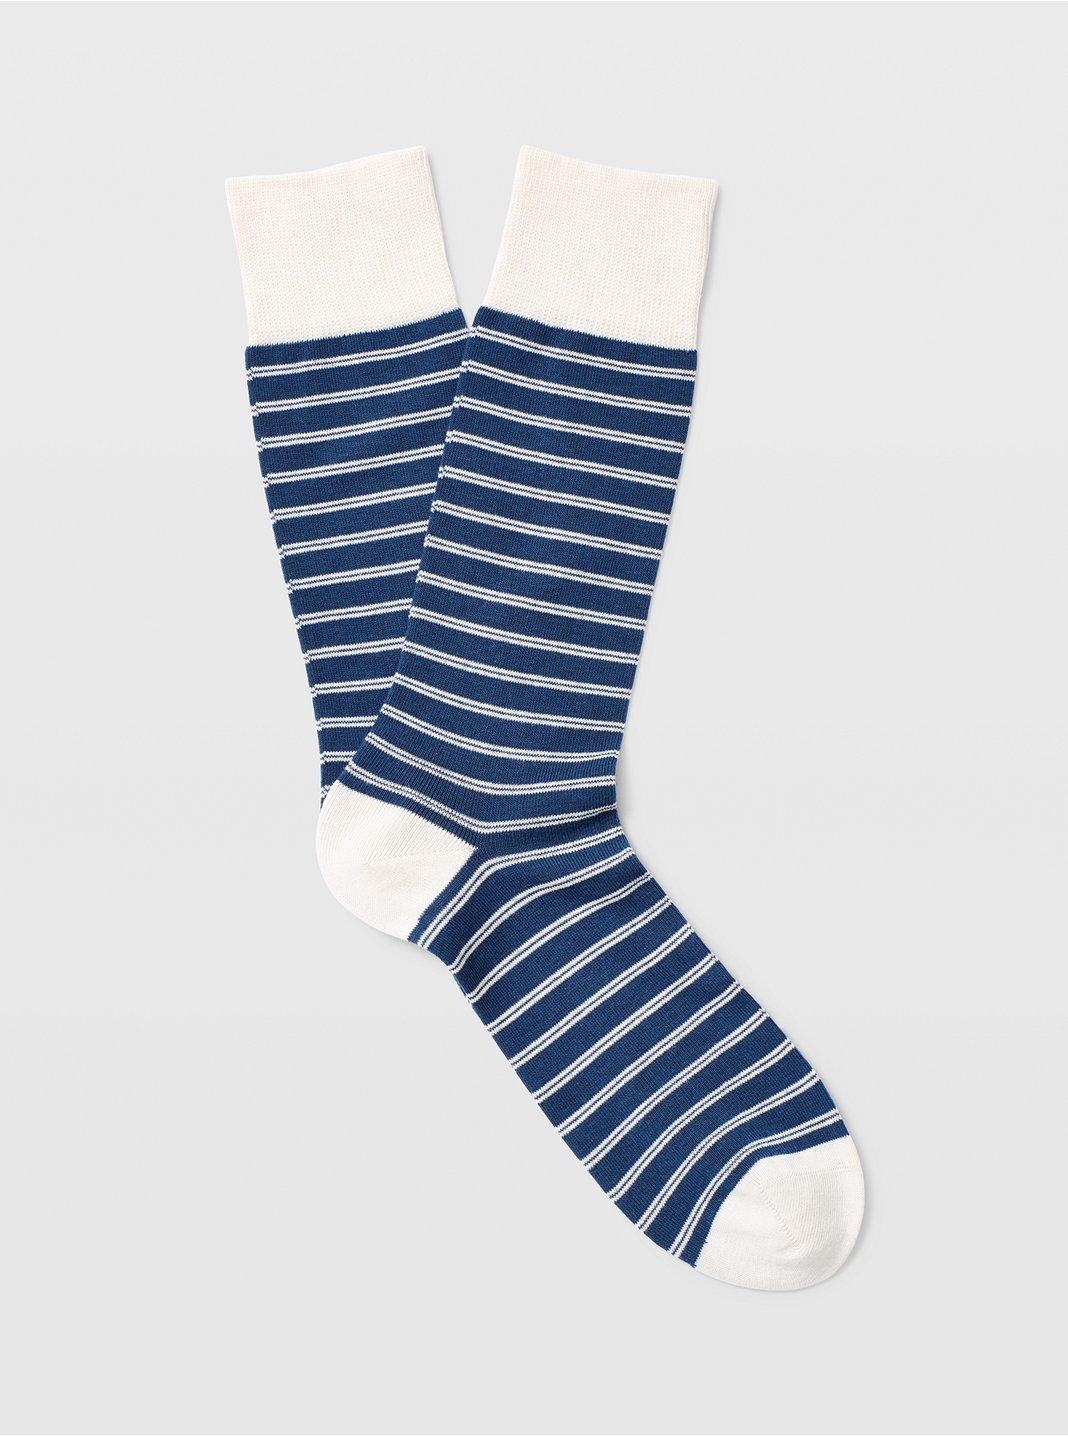 Double Striped Sock